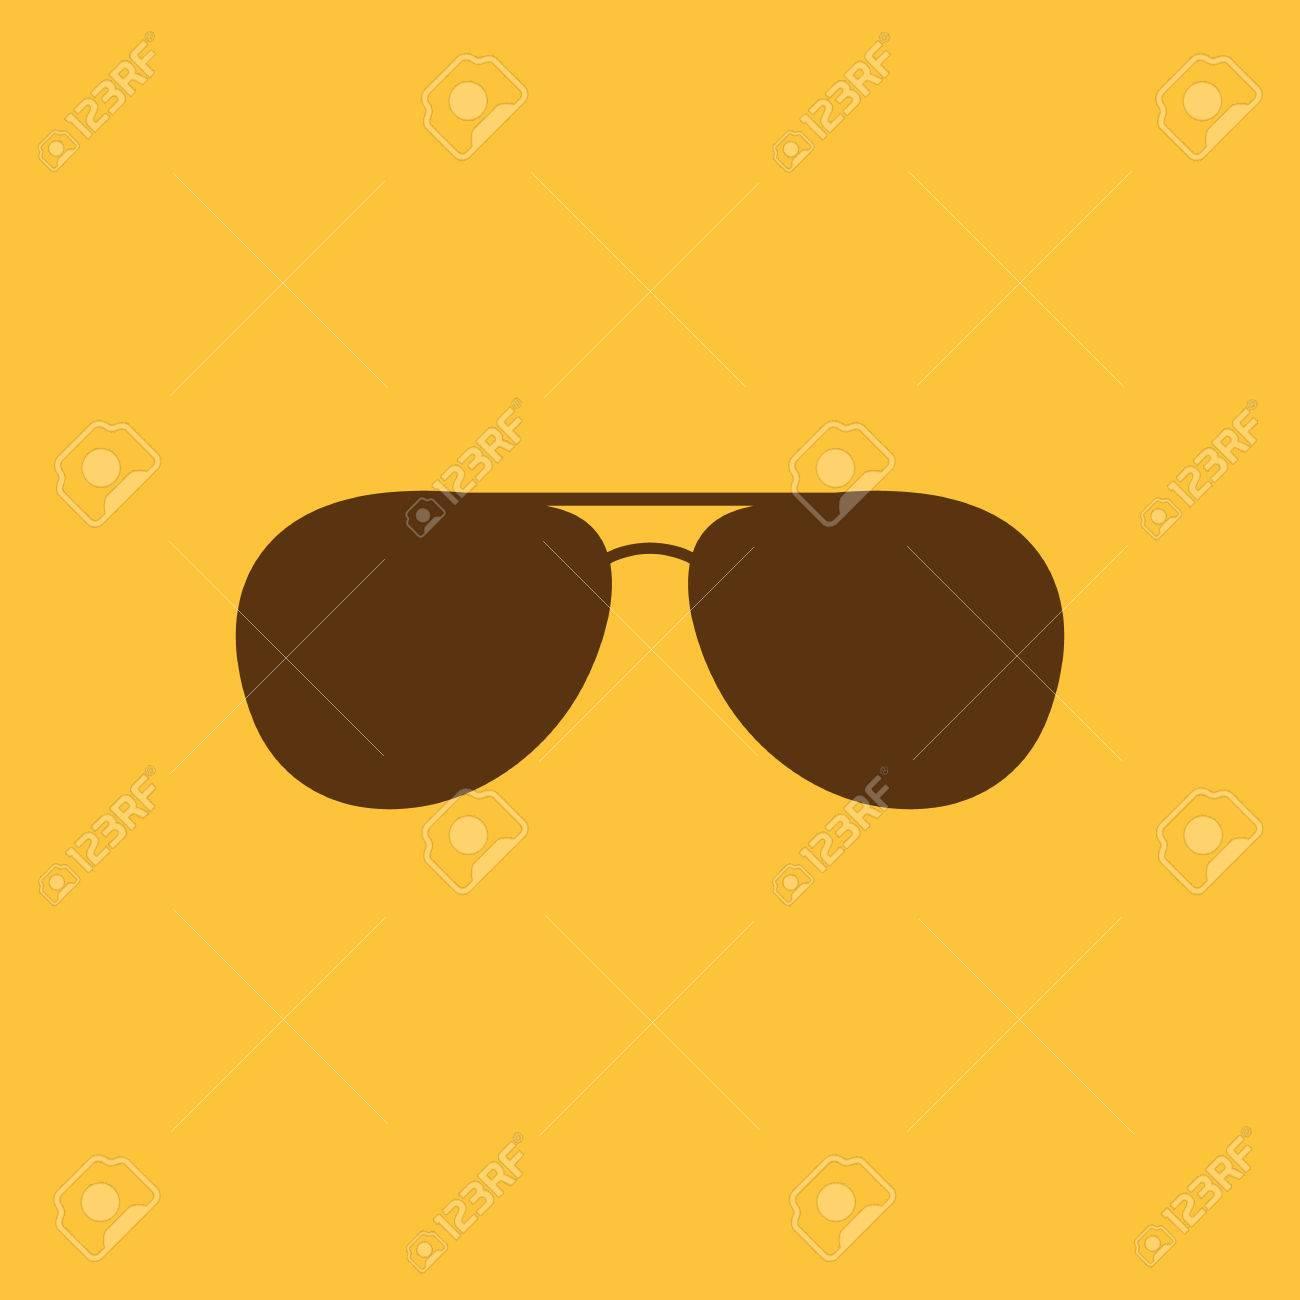 The Sunglasses Icon Glasses Symbol Flat Vector Illustration